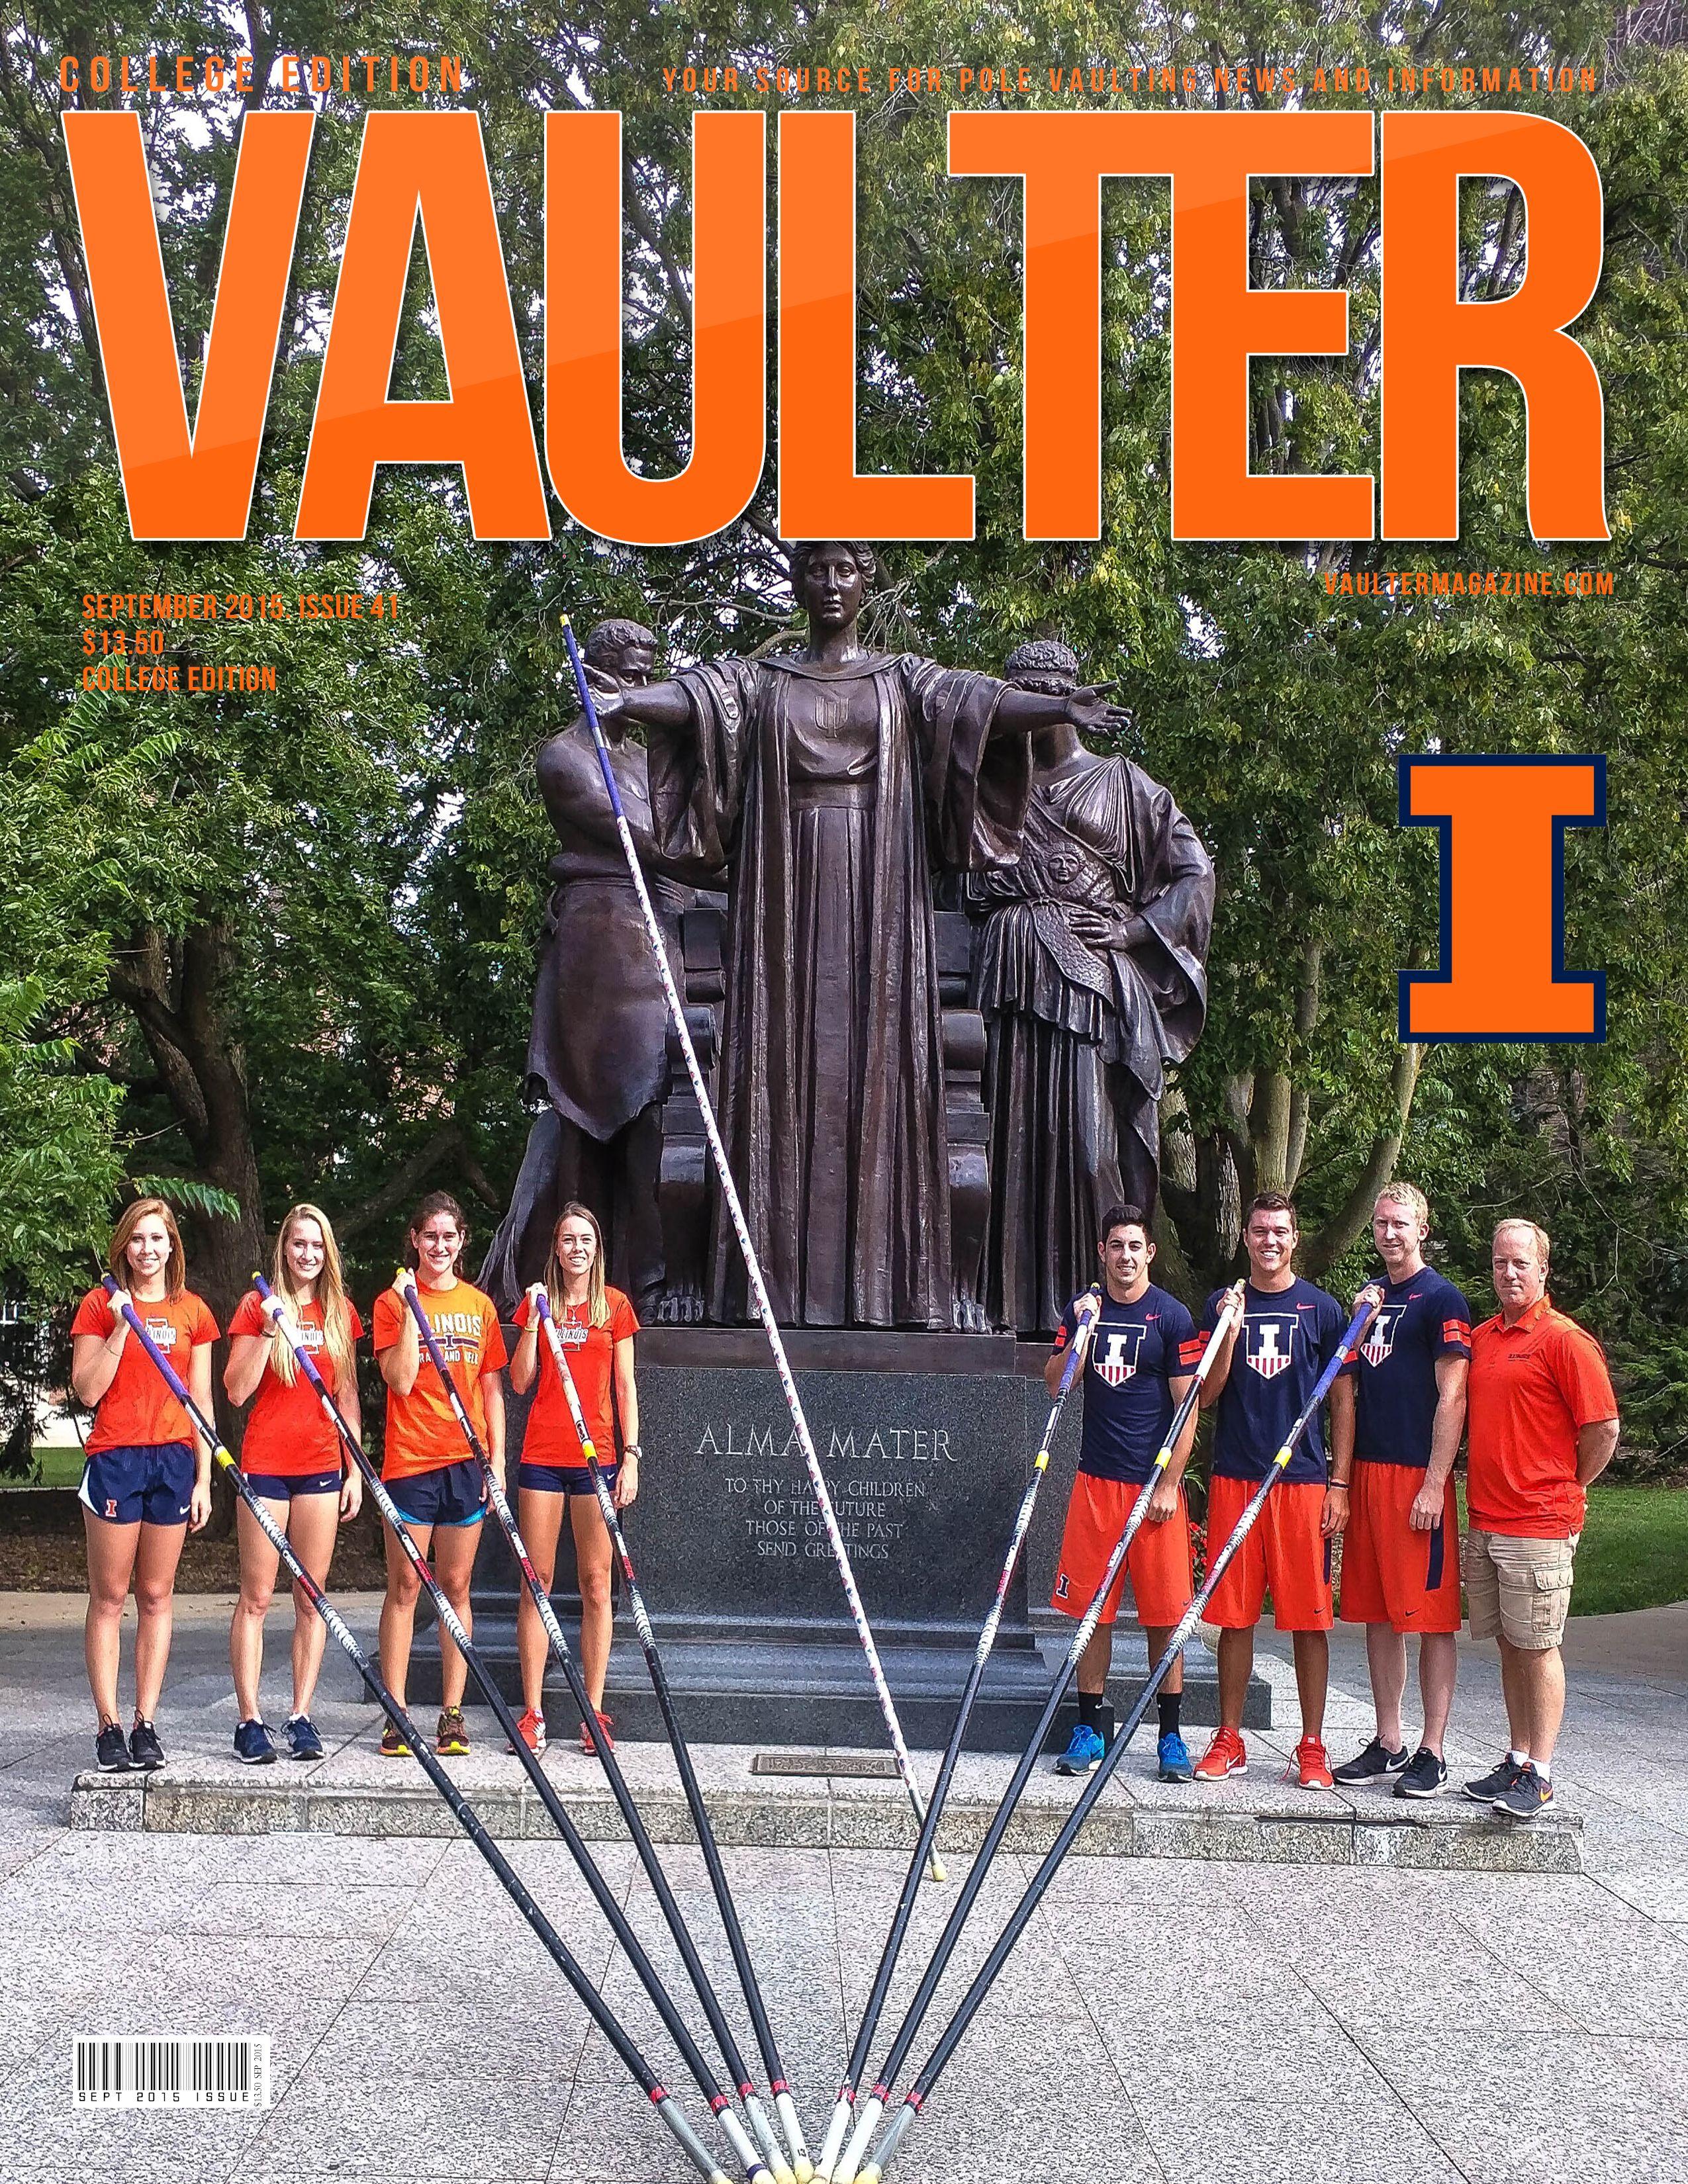 September Issue Of Vaulter Magazine On Sale Now University Of Illinois And Pole Vault Junkies Club Pole Vault Illinois University